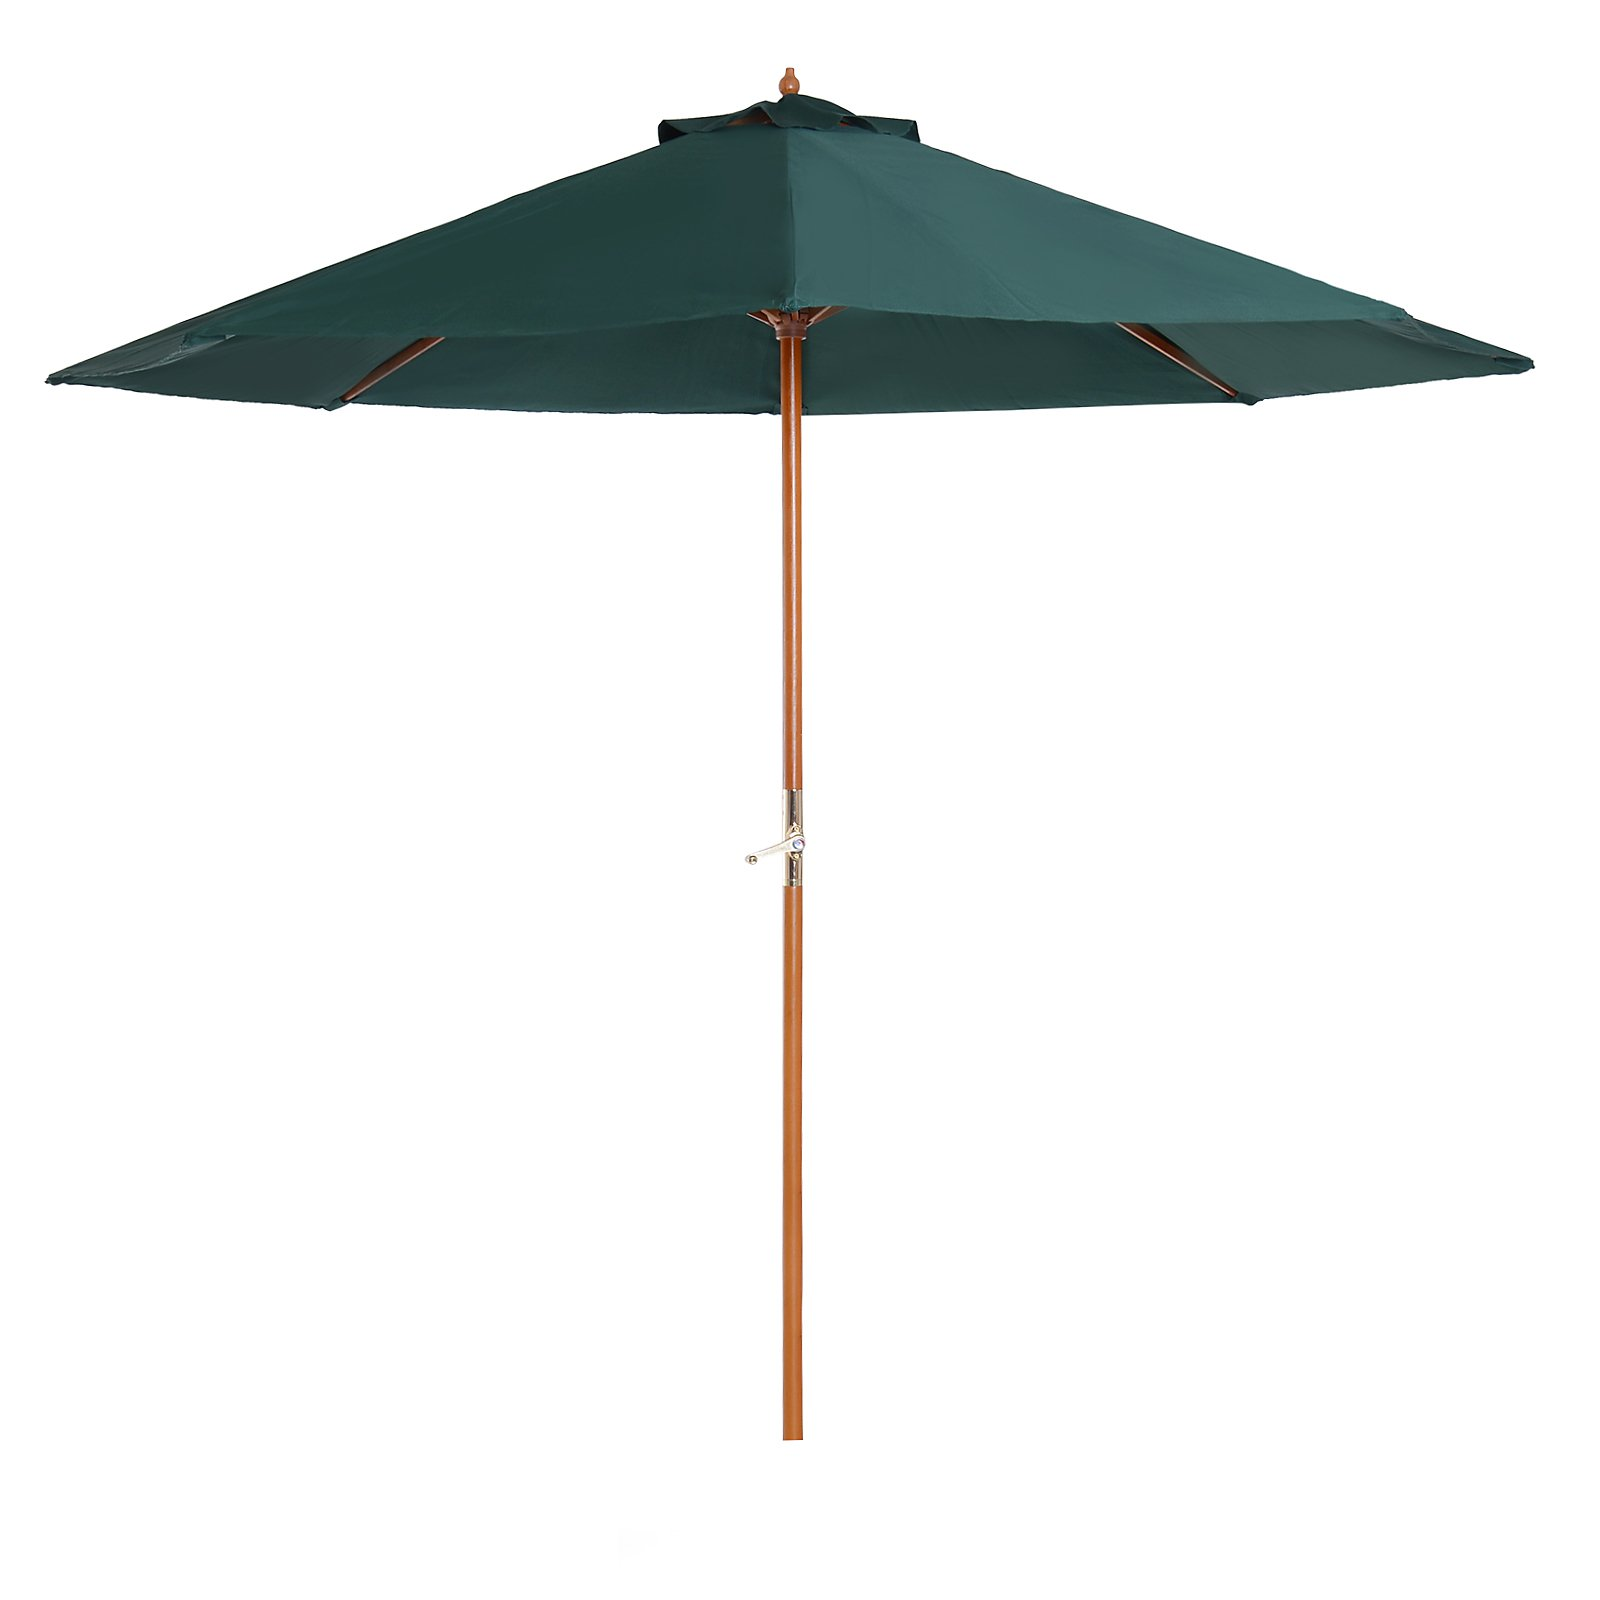 Sonnenschirm Mit Handkurbel Jetzt Bei Weltbildde Bestellen